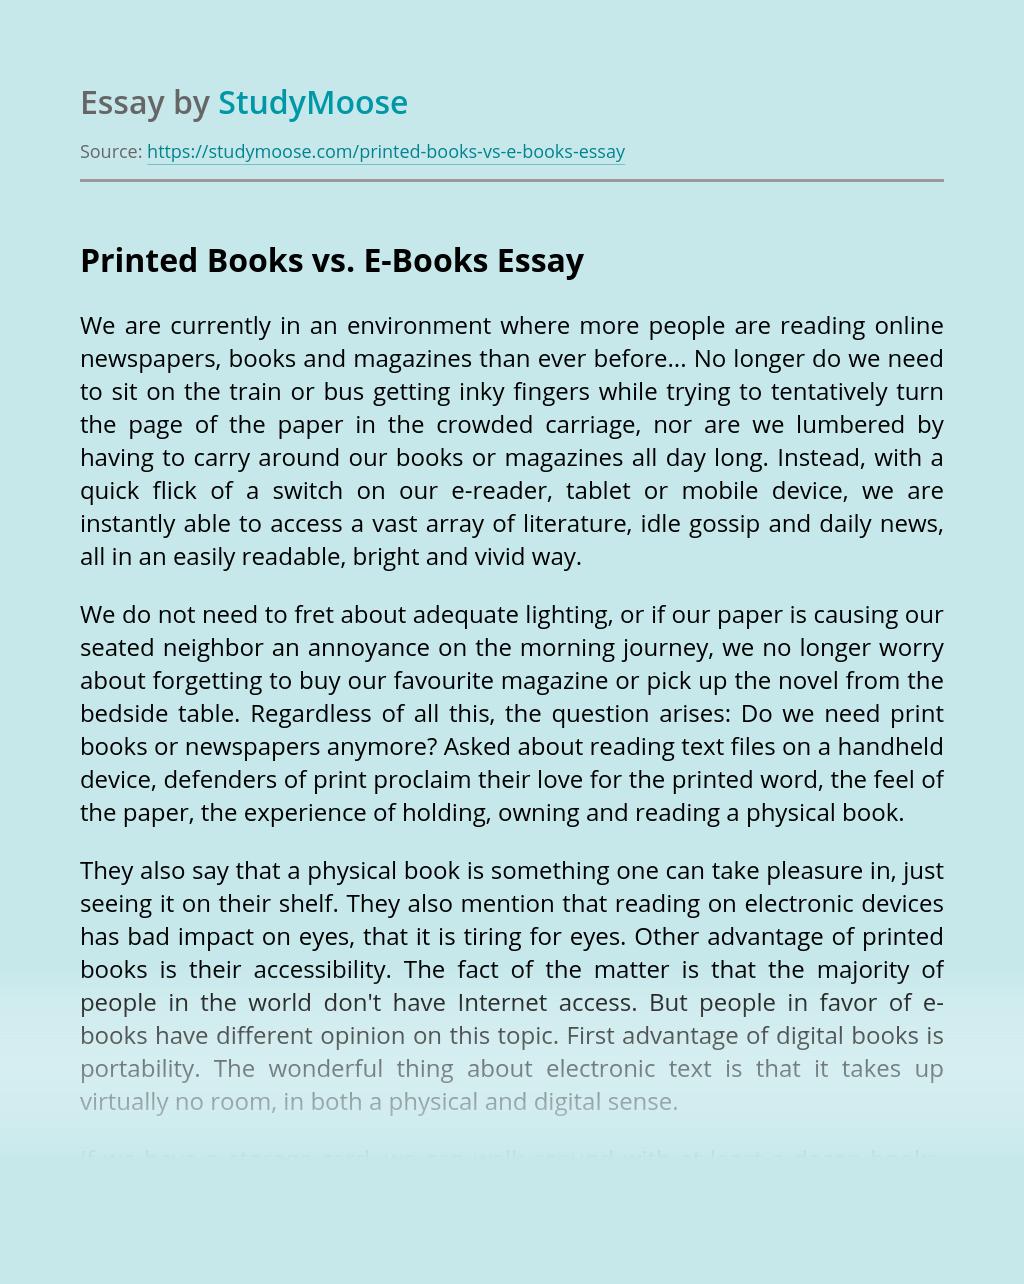 Printed Books vs. E-Books